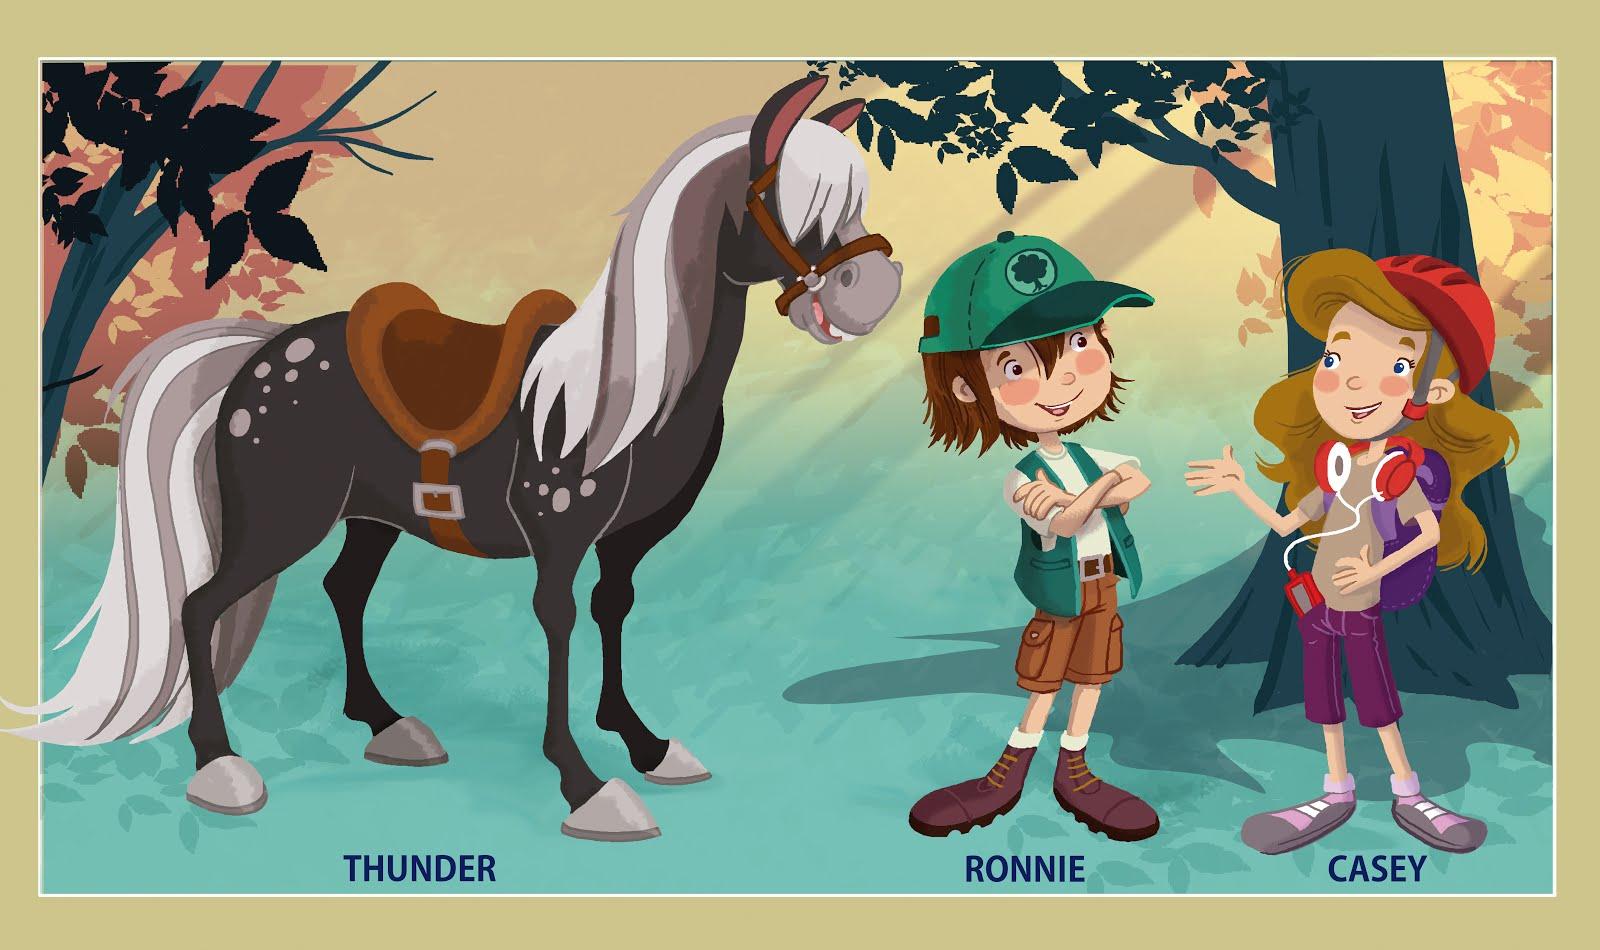 Personajes , para libros de lengua Inglesa Editorial Mac millan